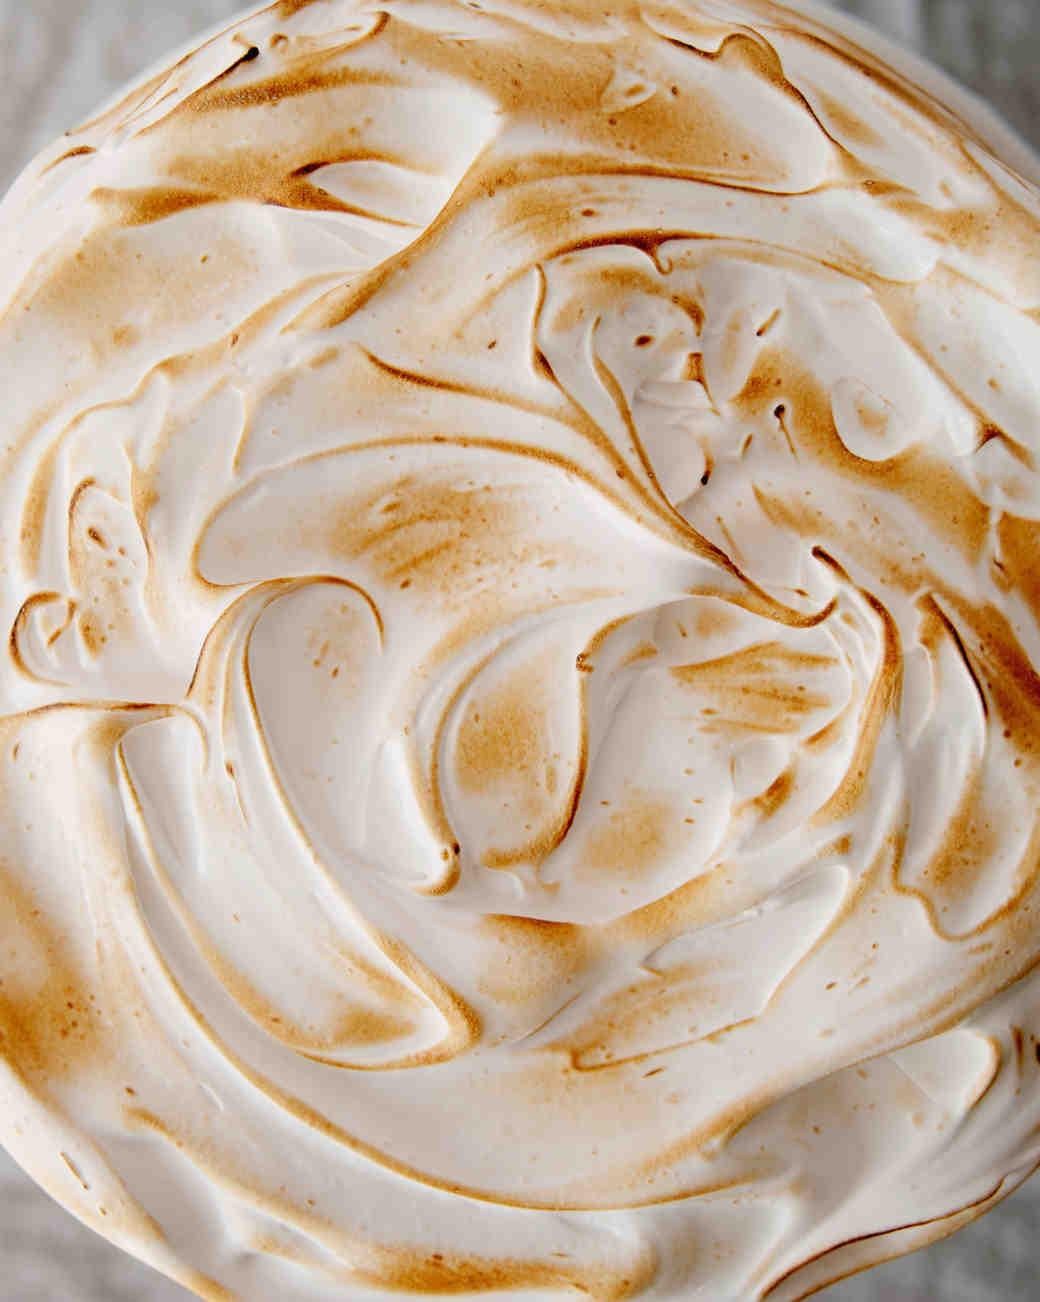 claire-thomas-bridal-shower-vintage-food-cake-top-0814.jpg